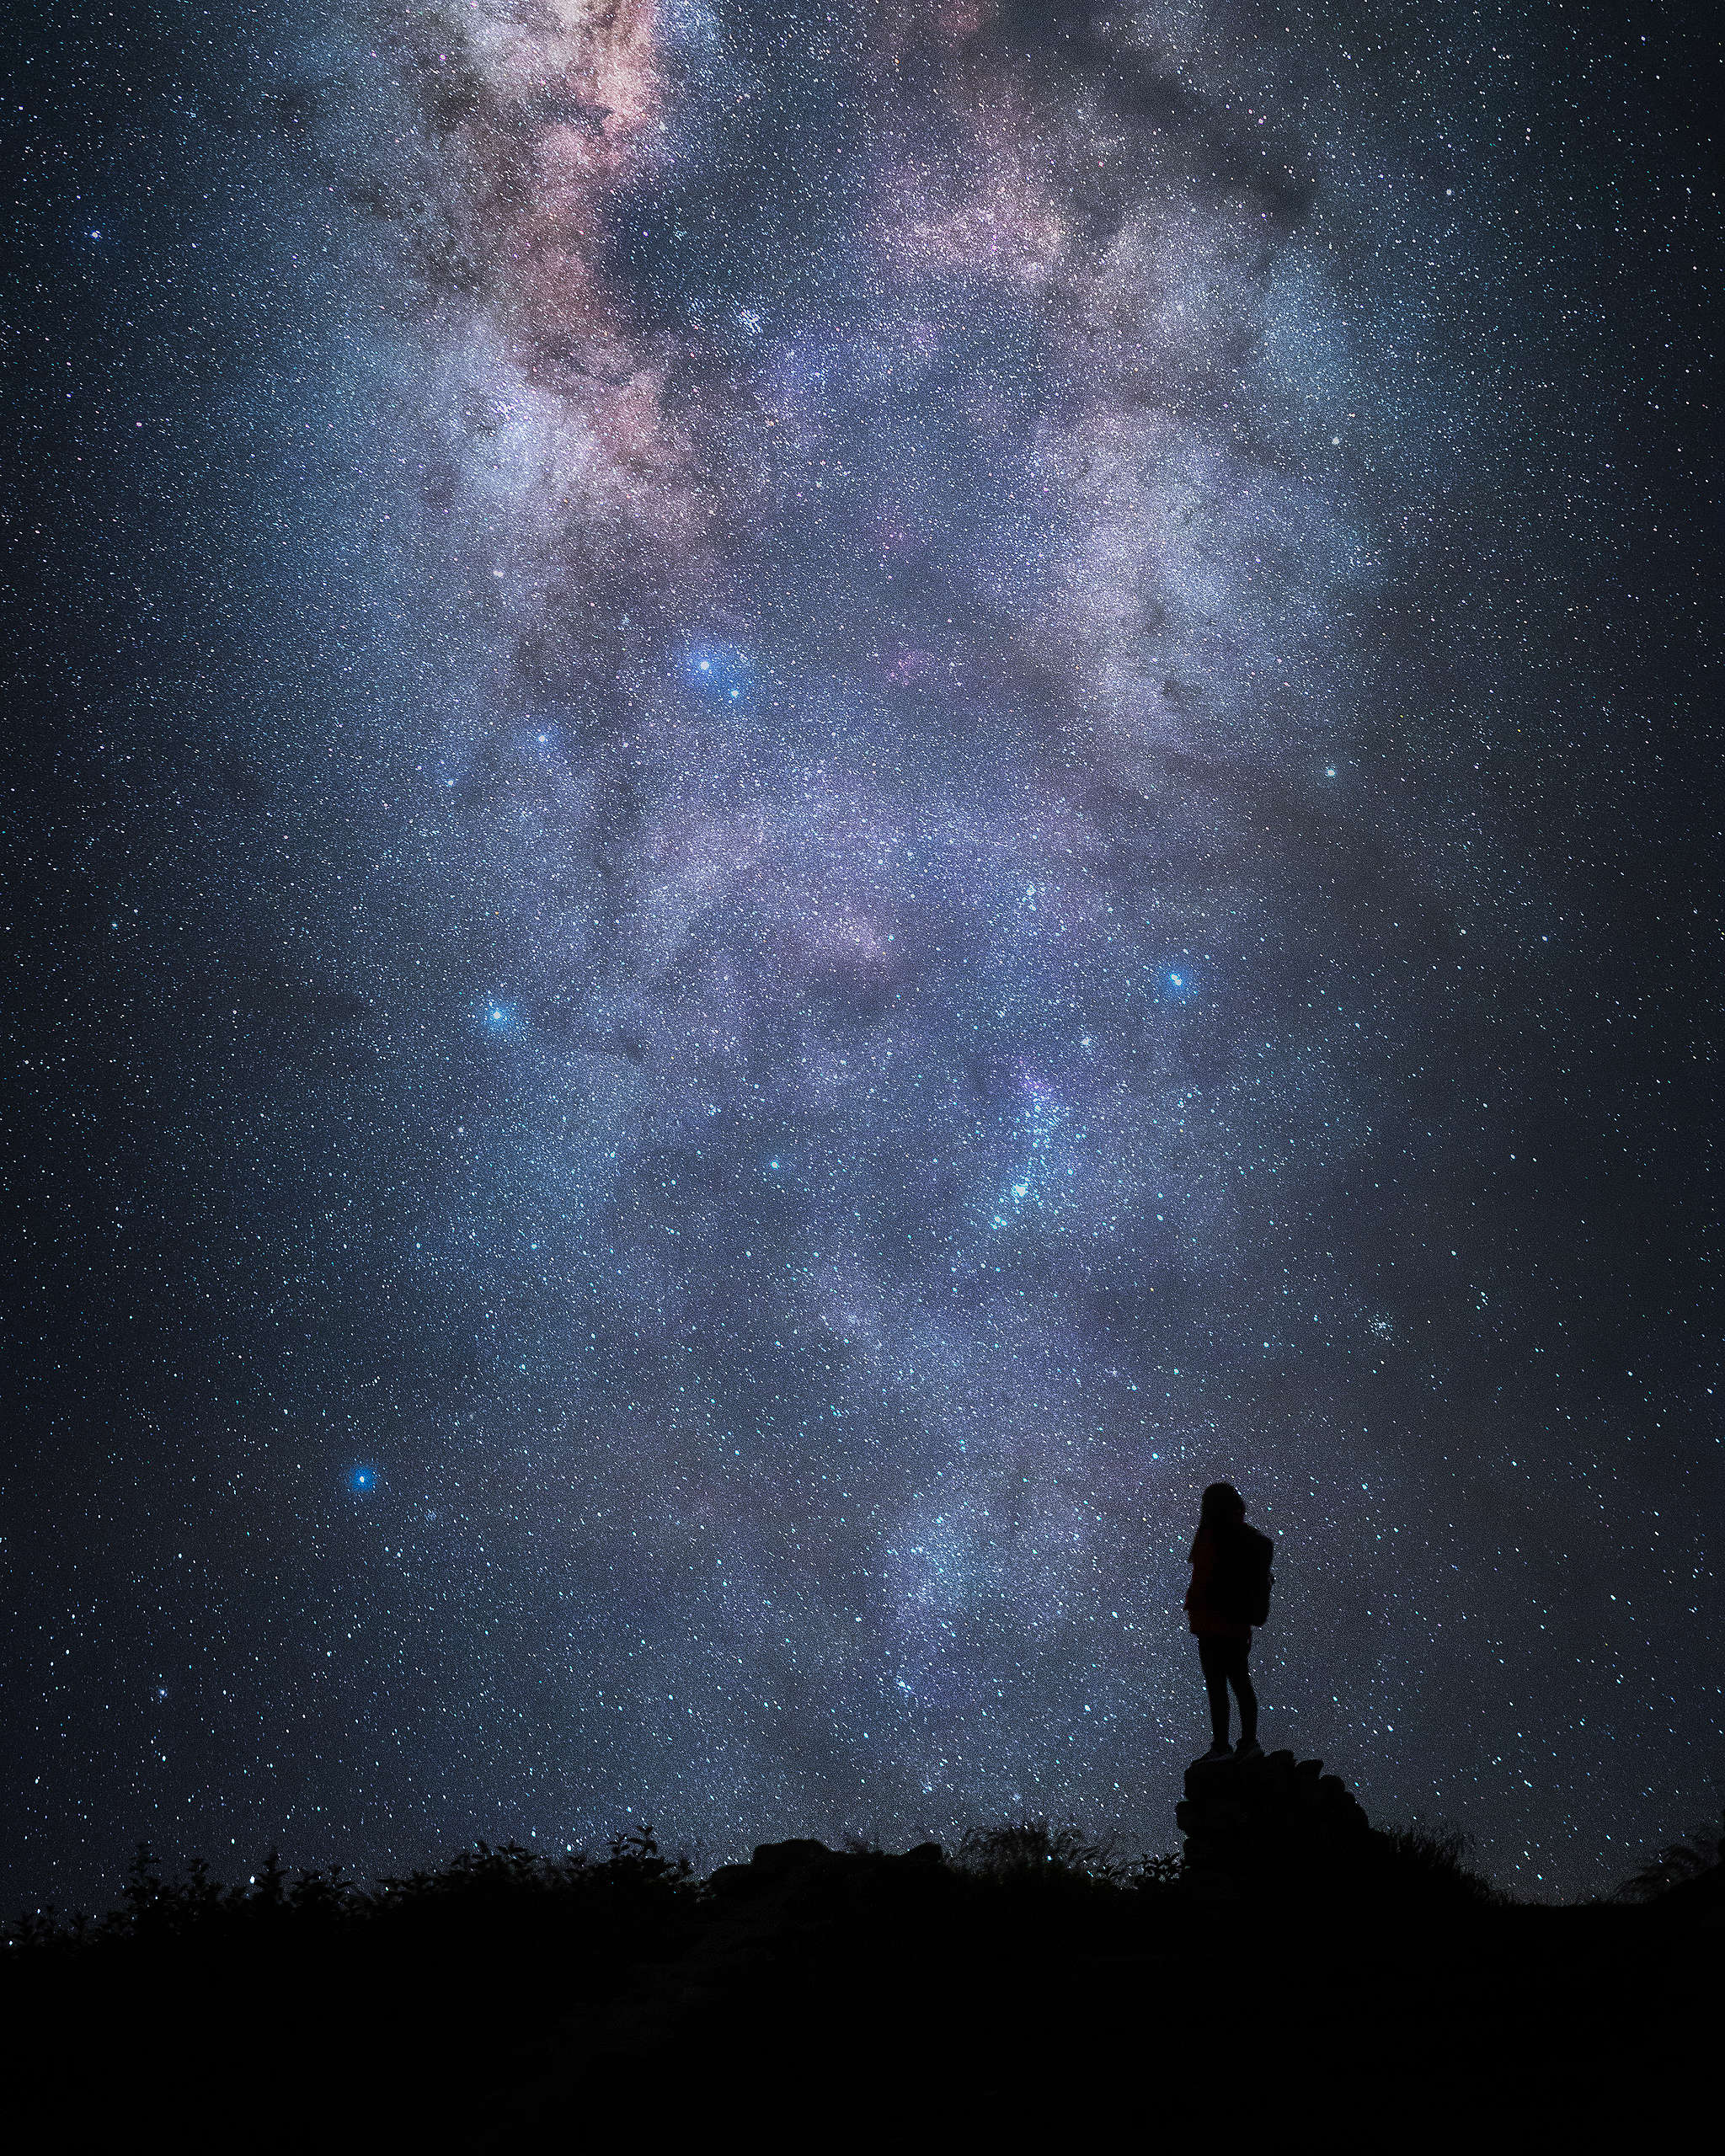 銀河核心部份。(8s F1.4 ISO2000)© Kelvin Yuen